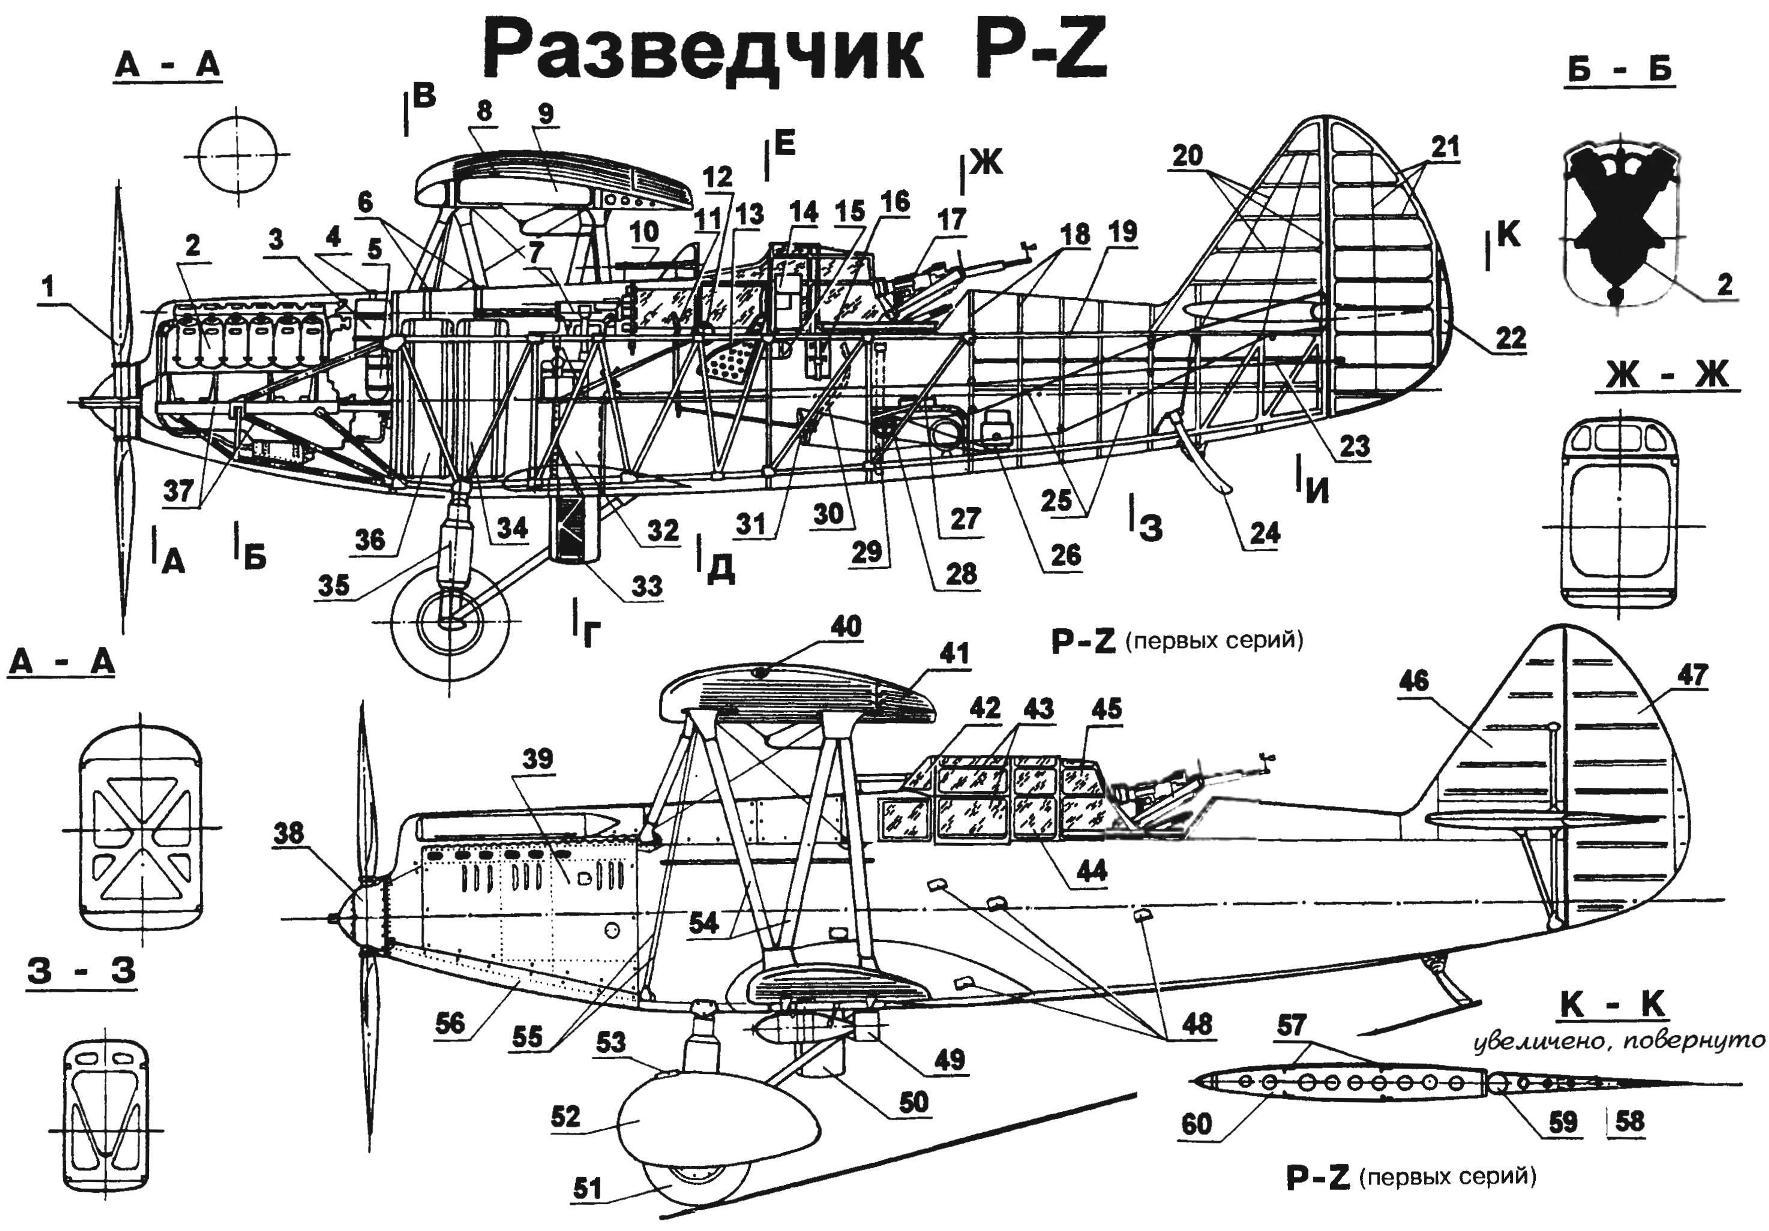 Разведчик-бомбардировщик P-Z